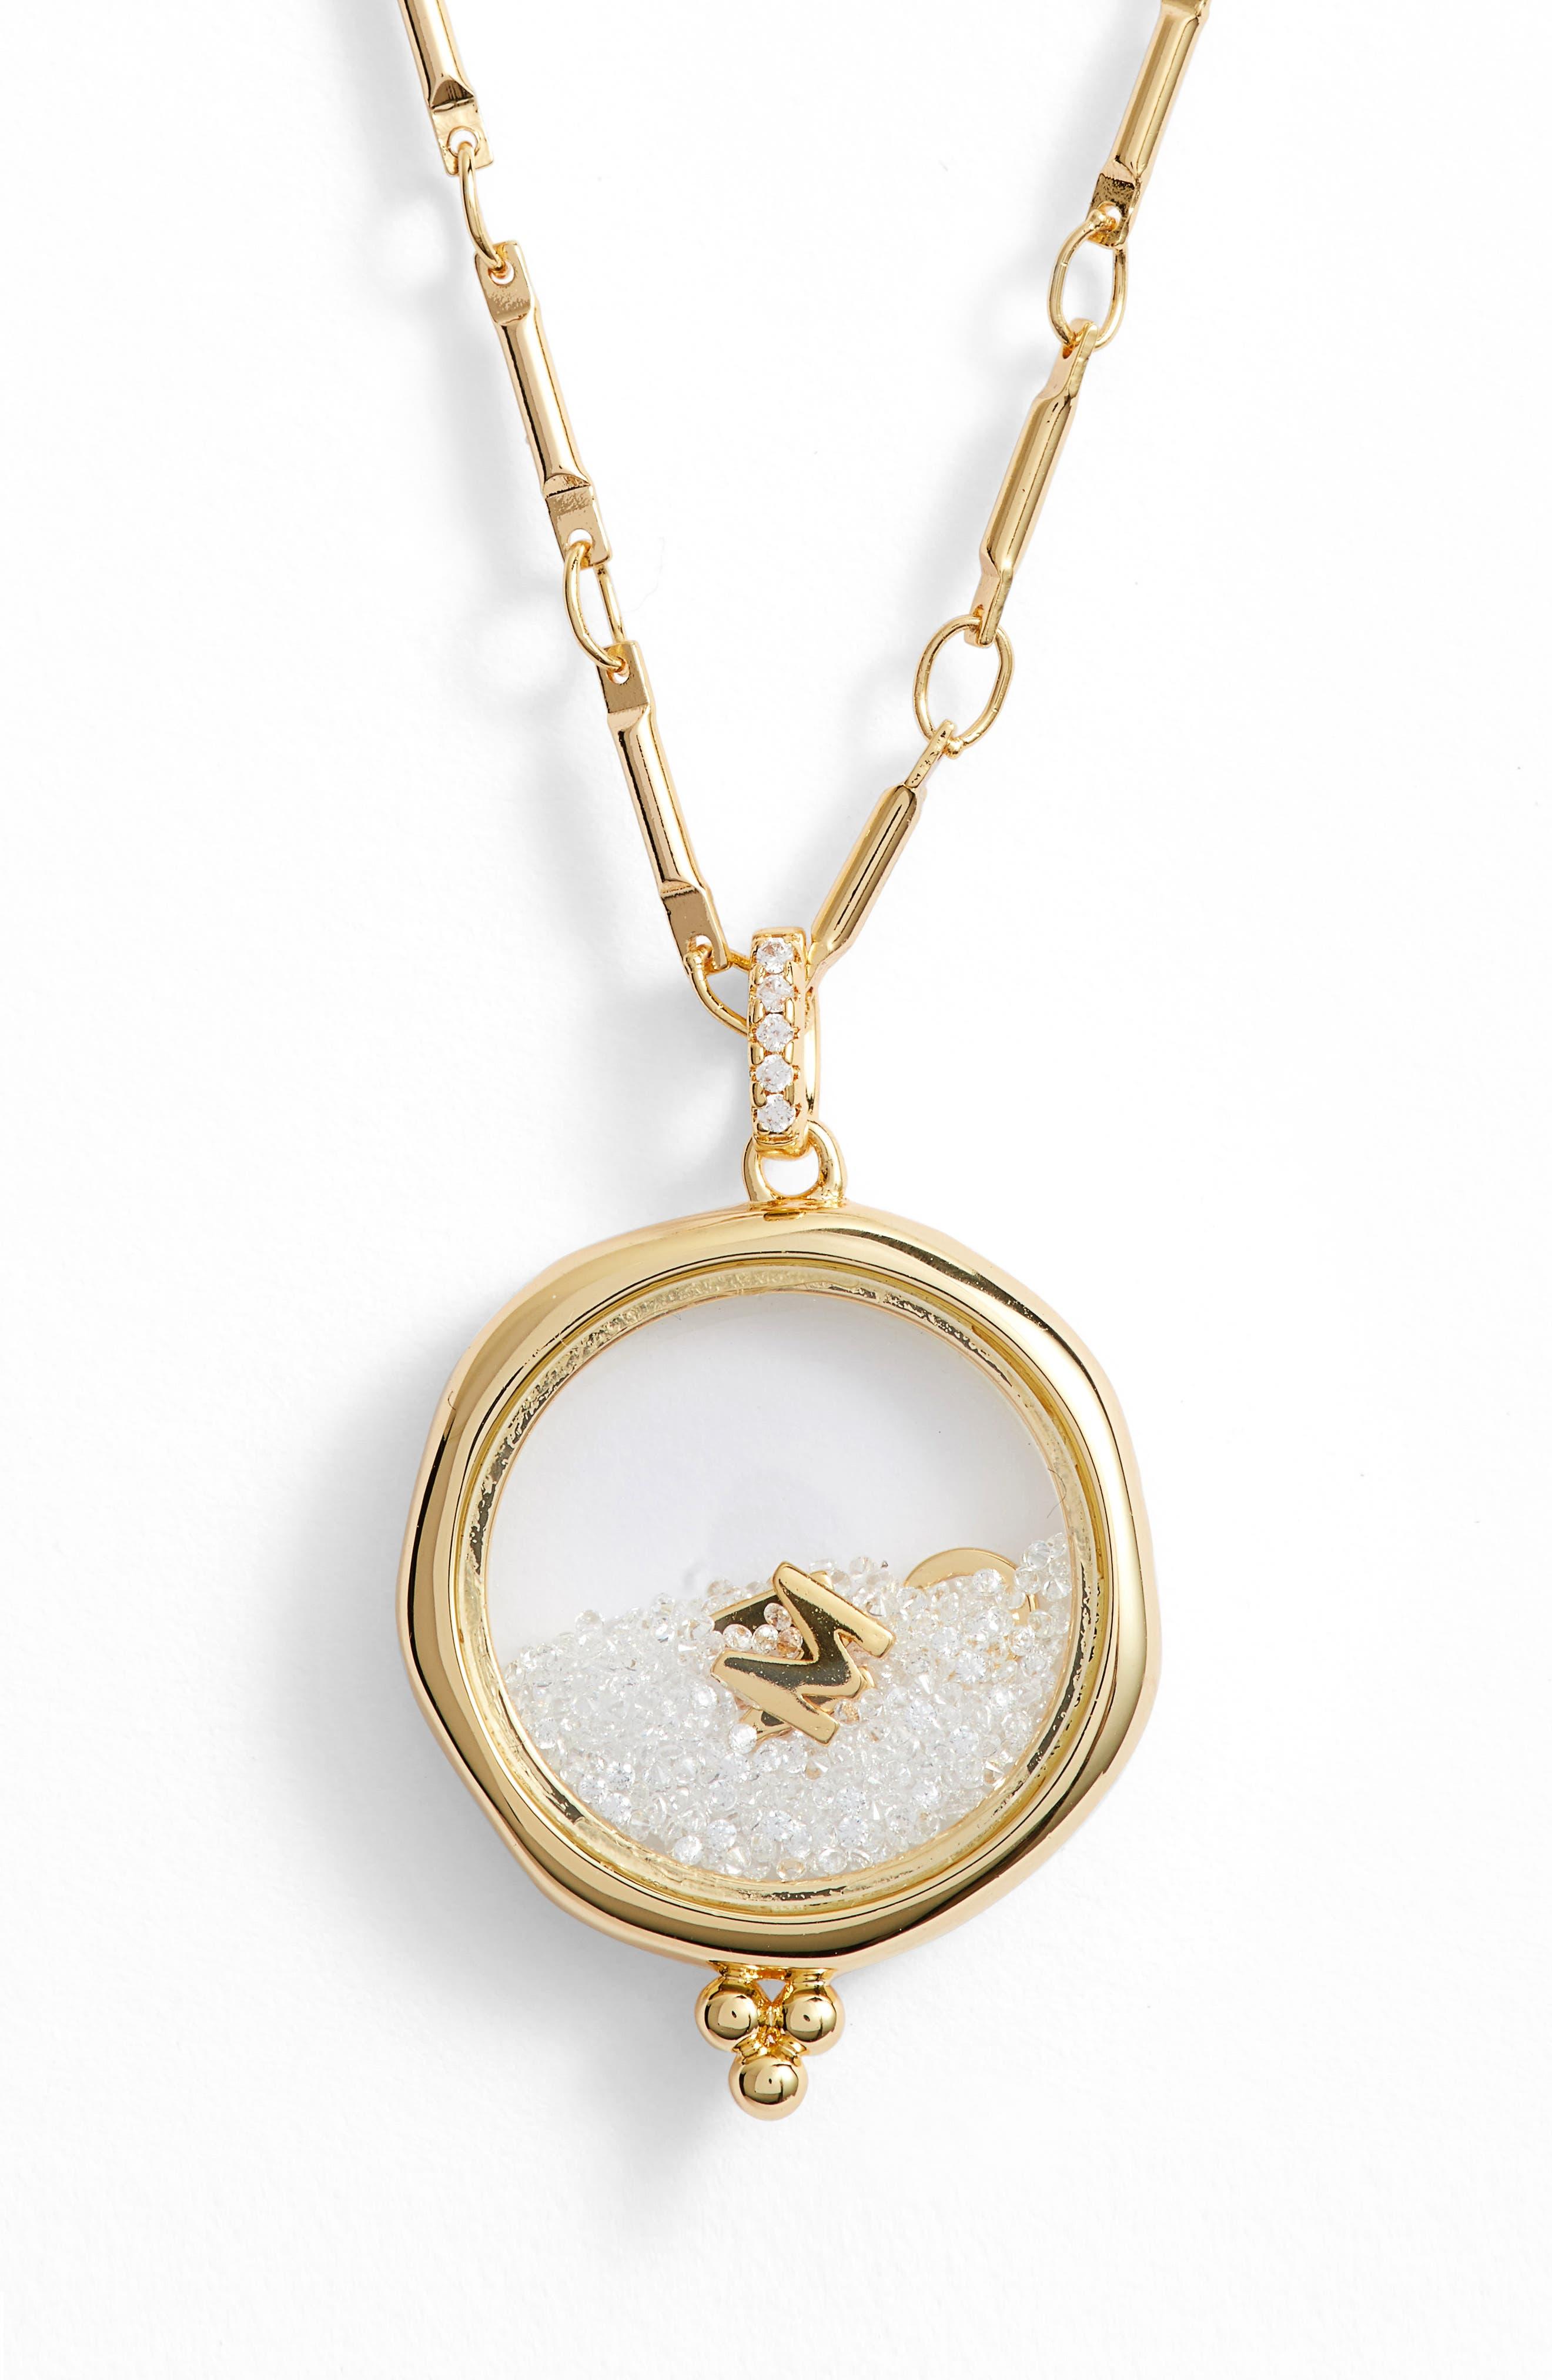 LULU DK X Kristina Schulman Mom Shaker Pendant Necklace in Gold